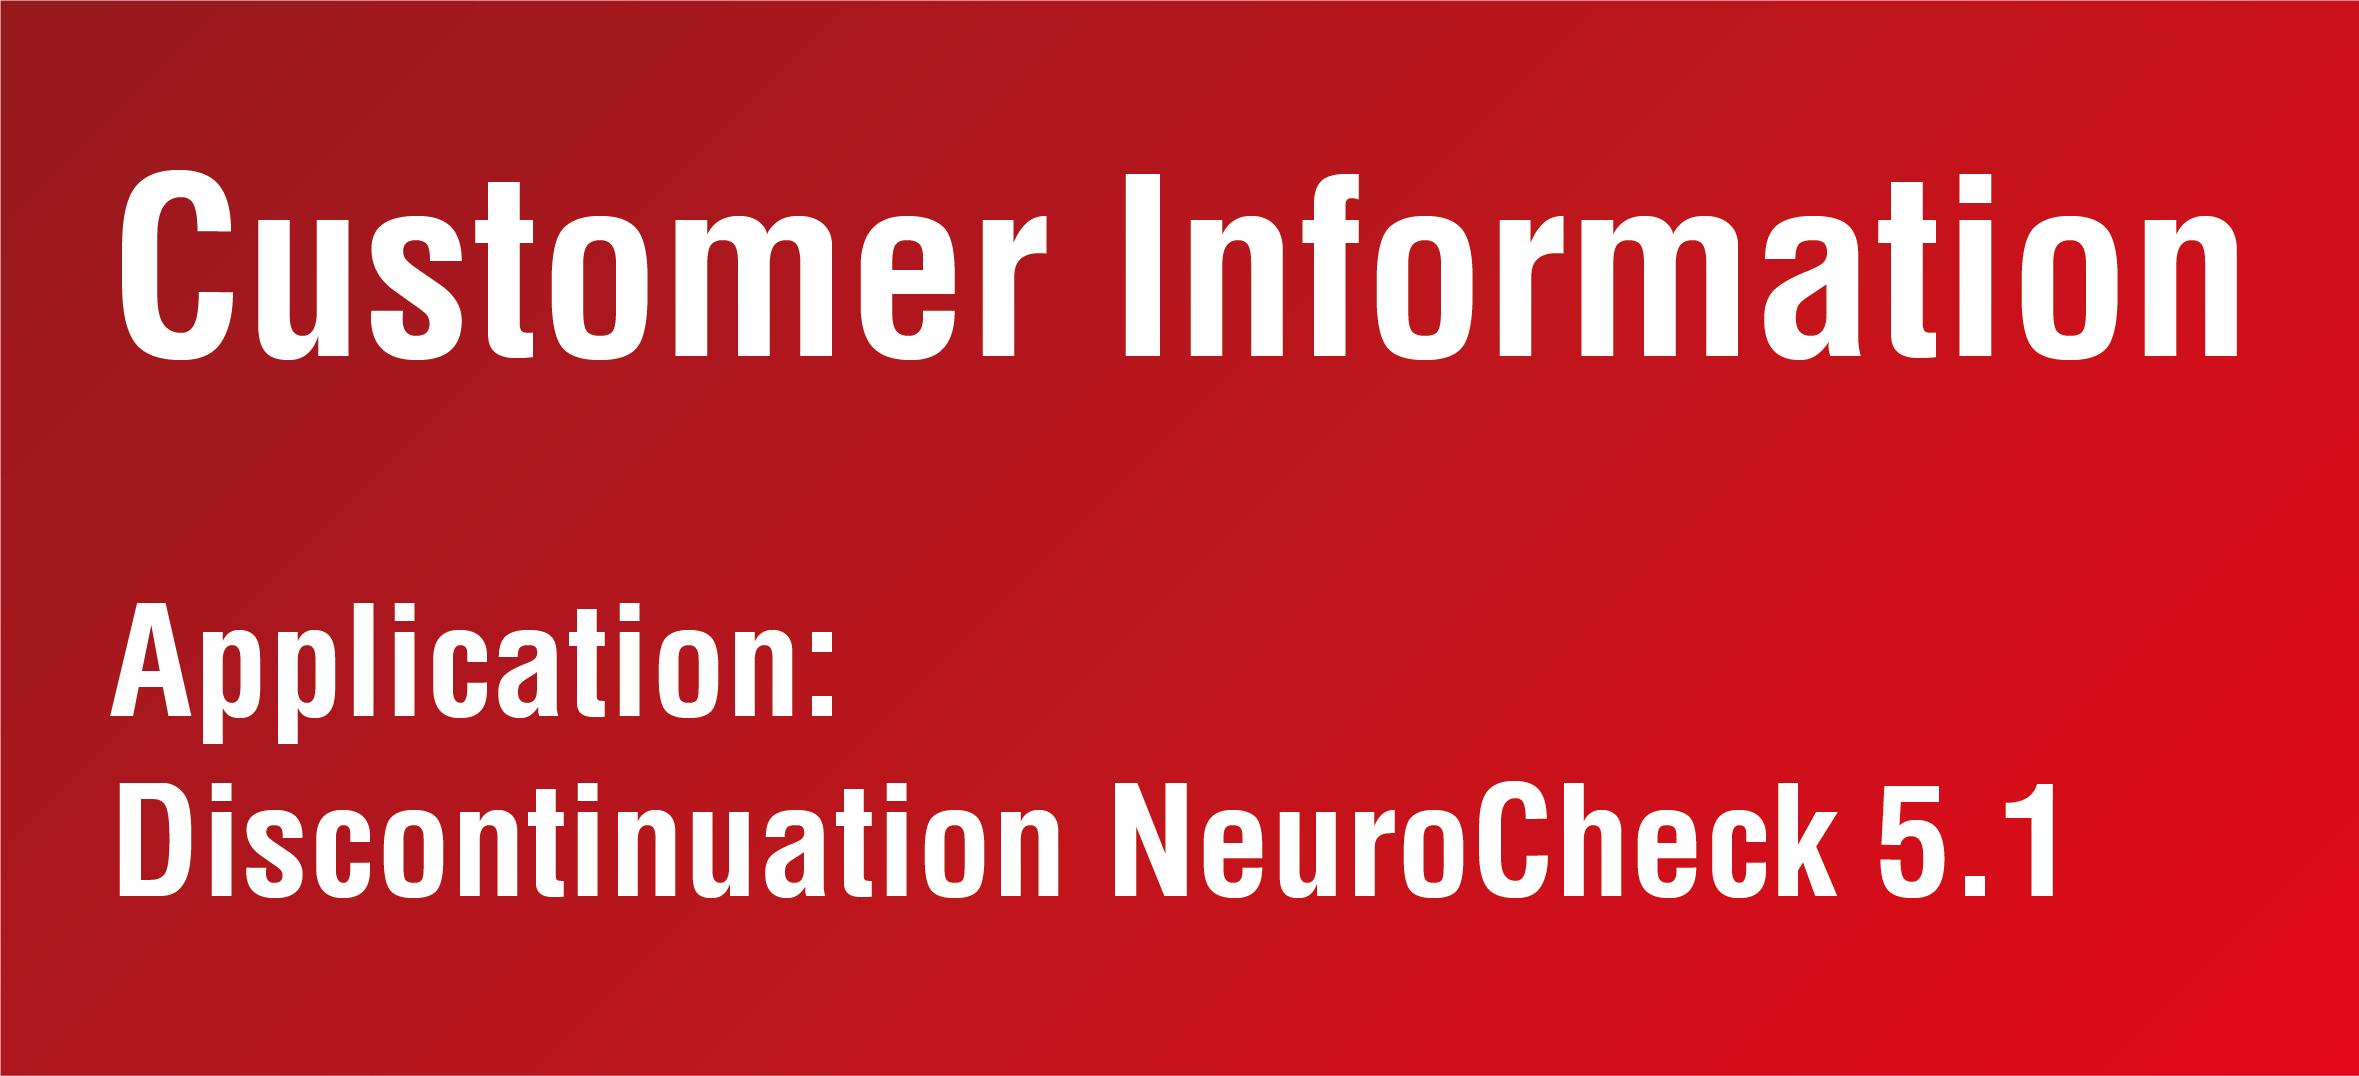 NeuroCheck - Customer Information Discontinuation NeuroCheck 5.1 (Image © NeuroCheck)